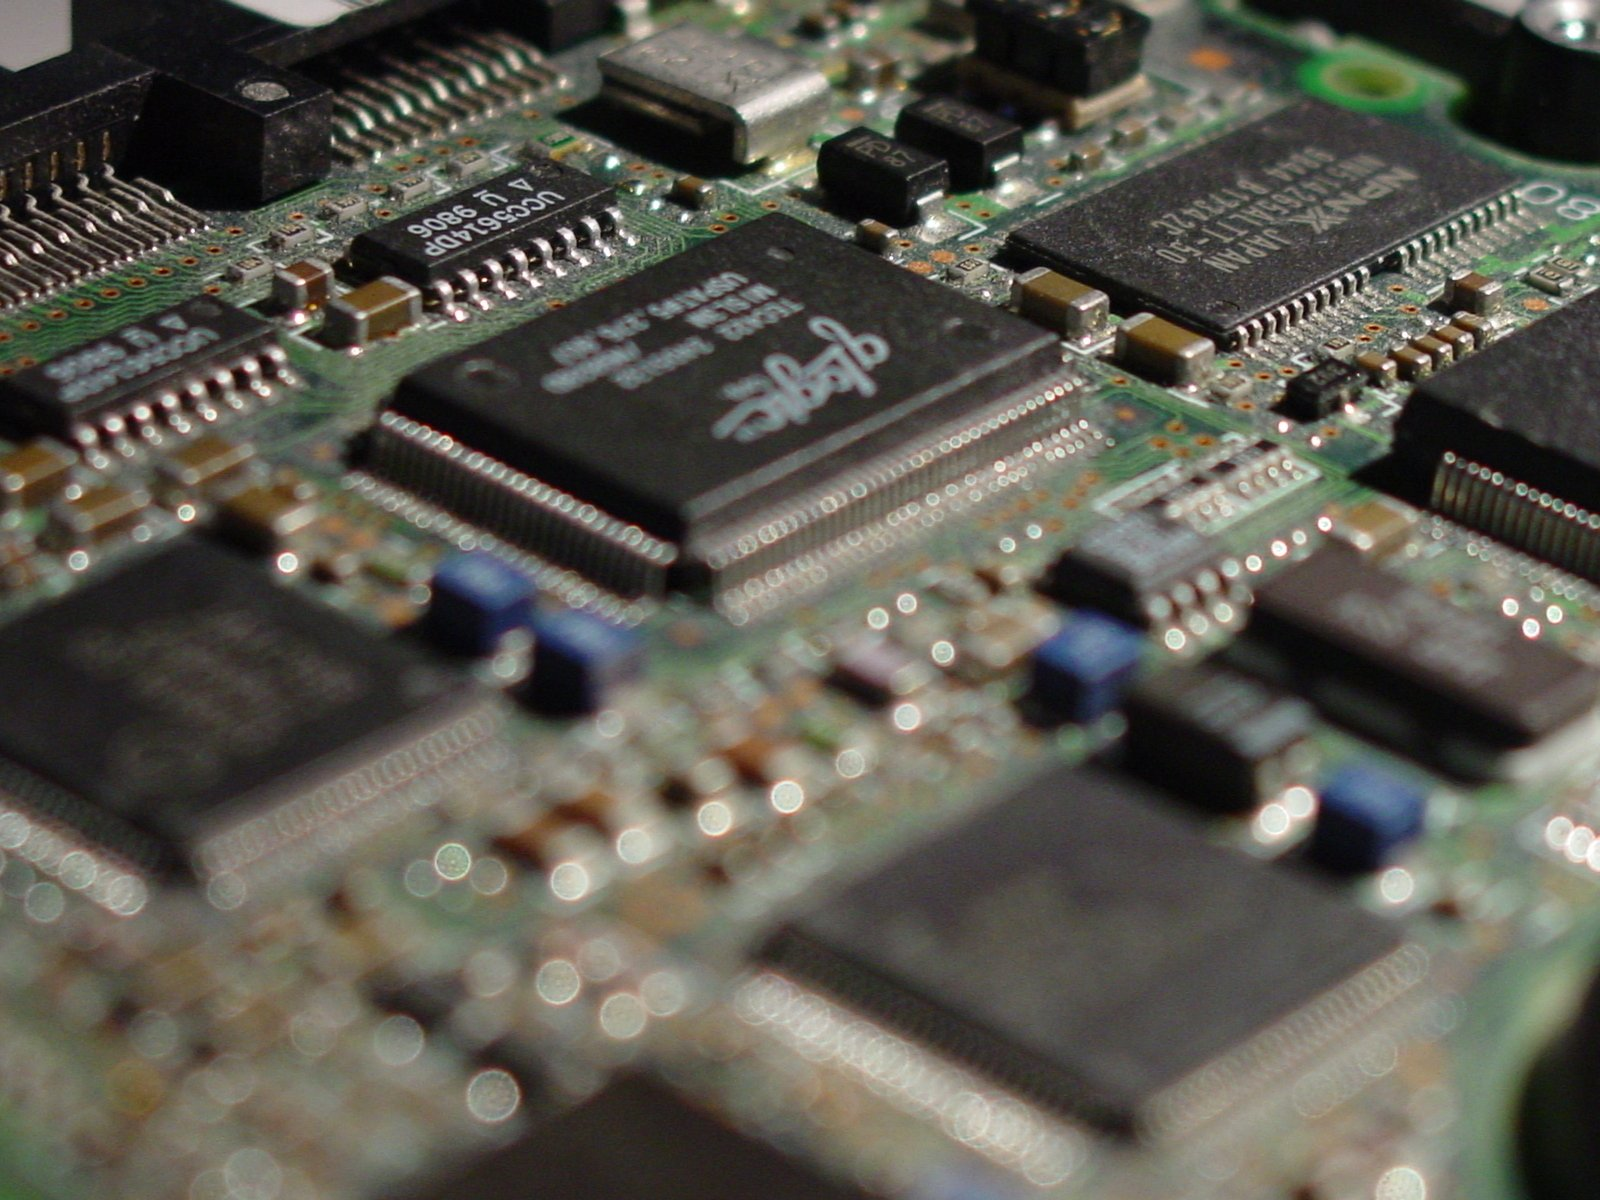 SCSI HD